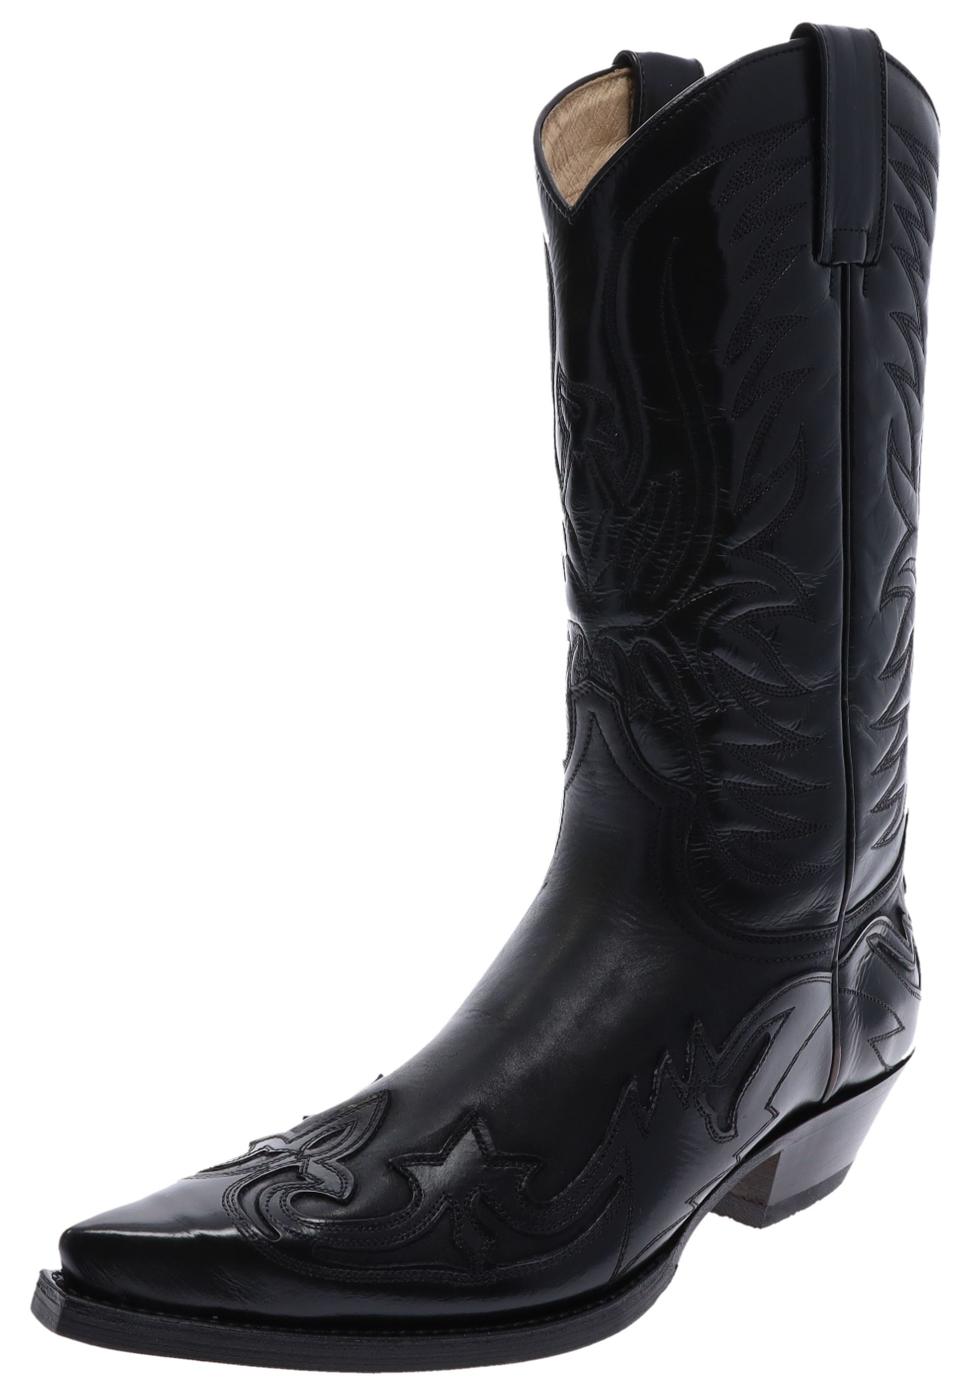 Sendra Boots 3241 WEST Florentic Sprinter Negro western laars - zwart